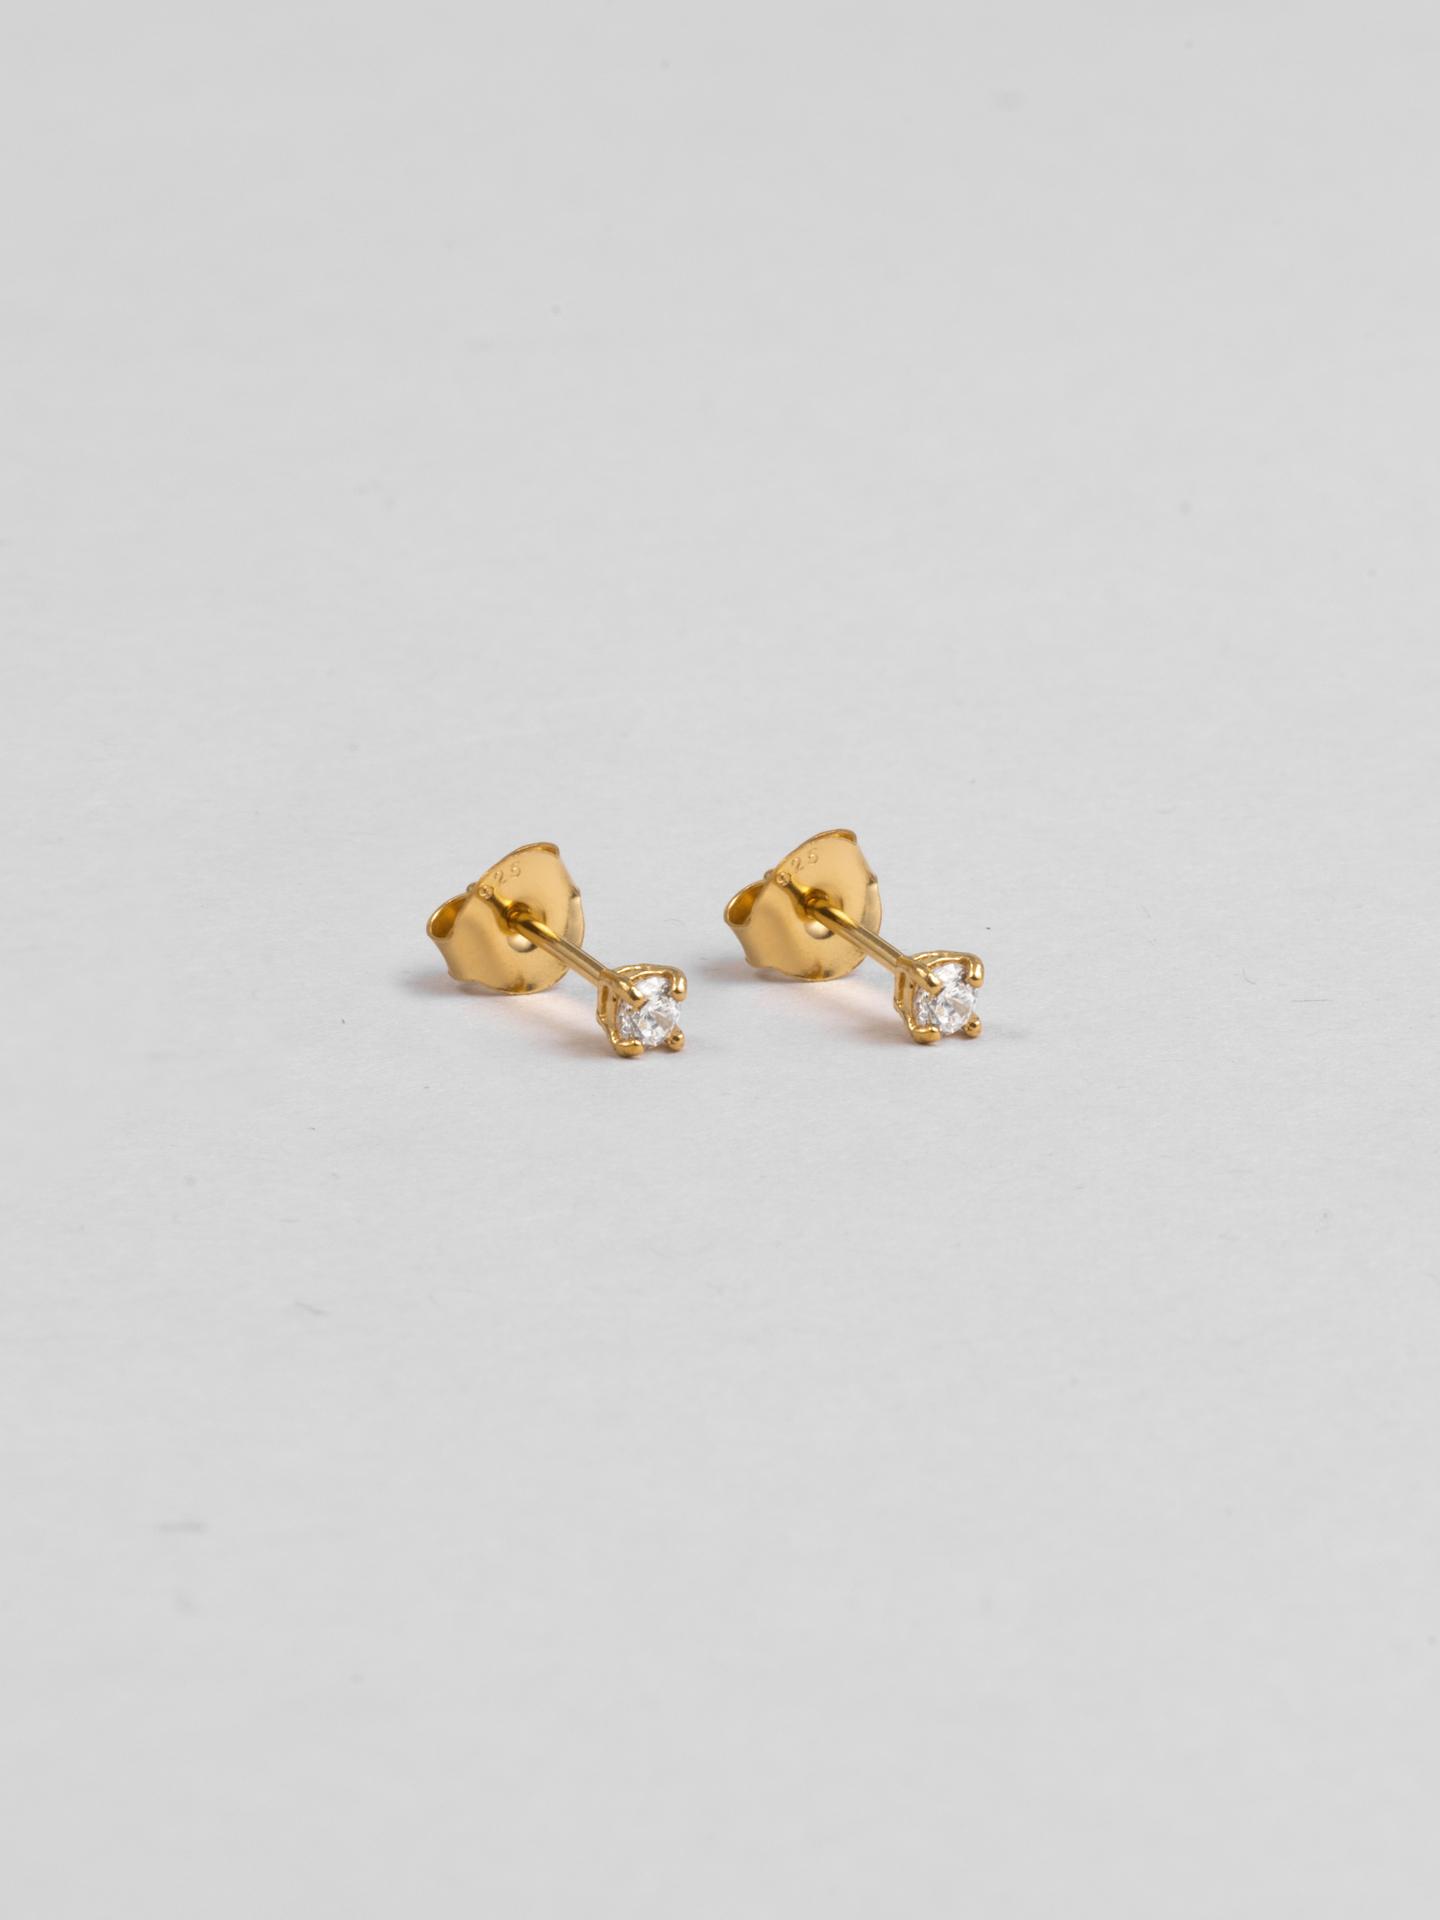 The One Earrings